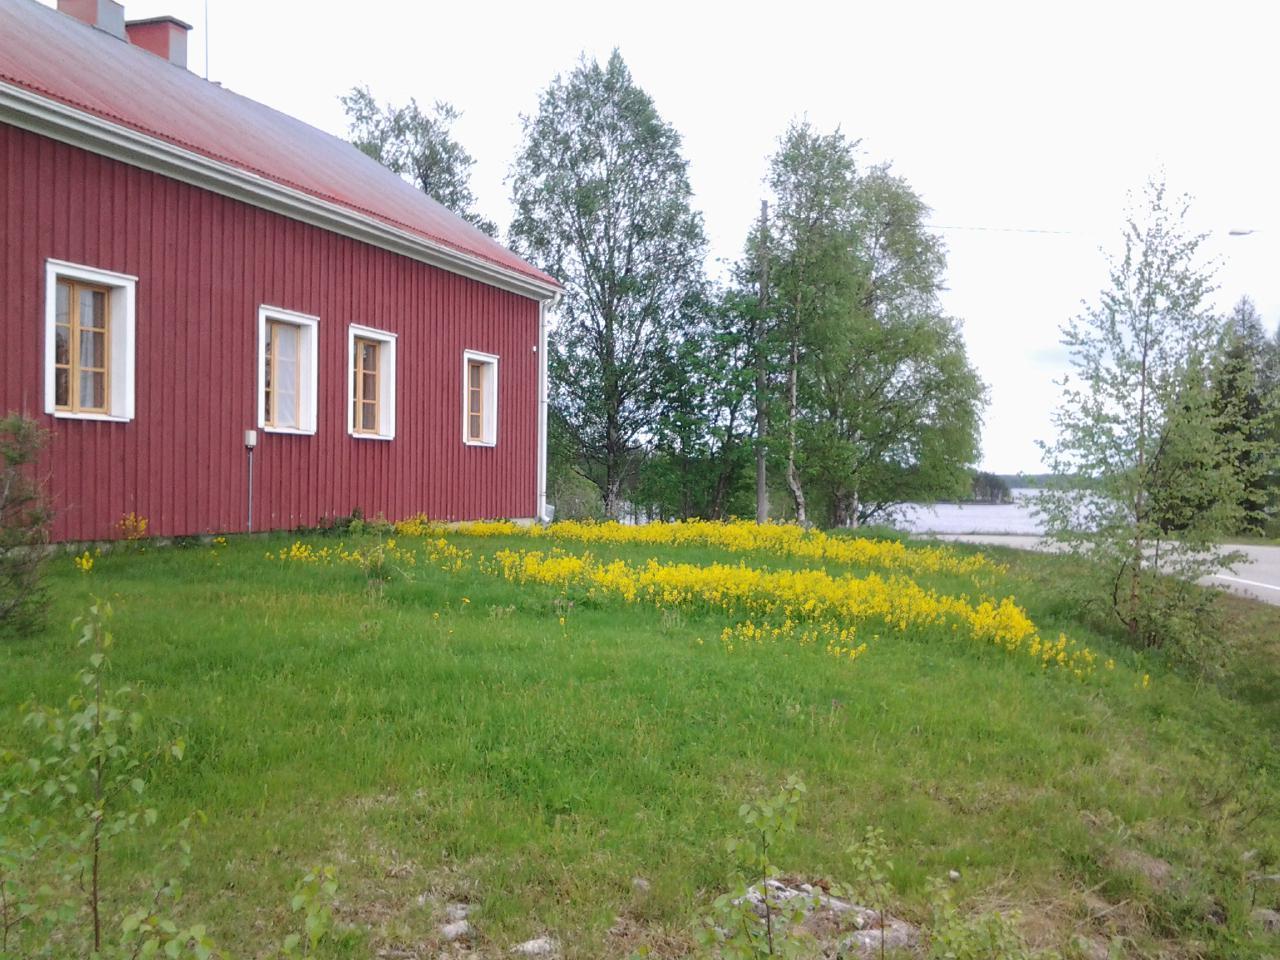 Maison de vacances Urlaub in der schönsten Gegend Finnlands (2177850), Suomussalmi, , Centre de la Finlande - Oulu, Finlande, image 2